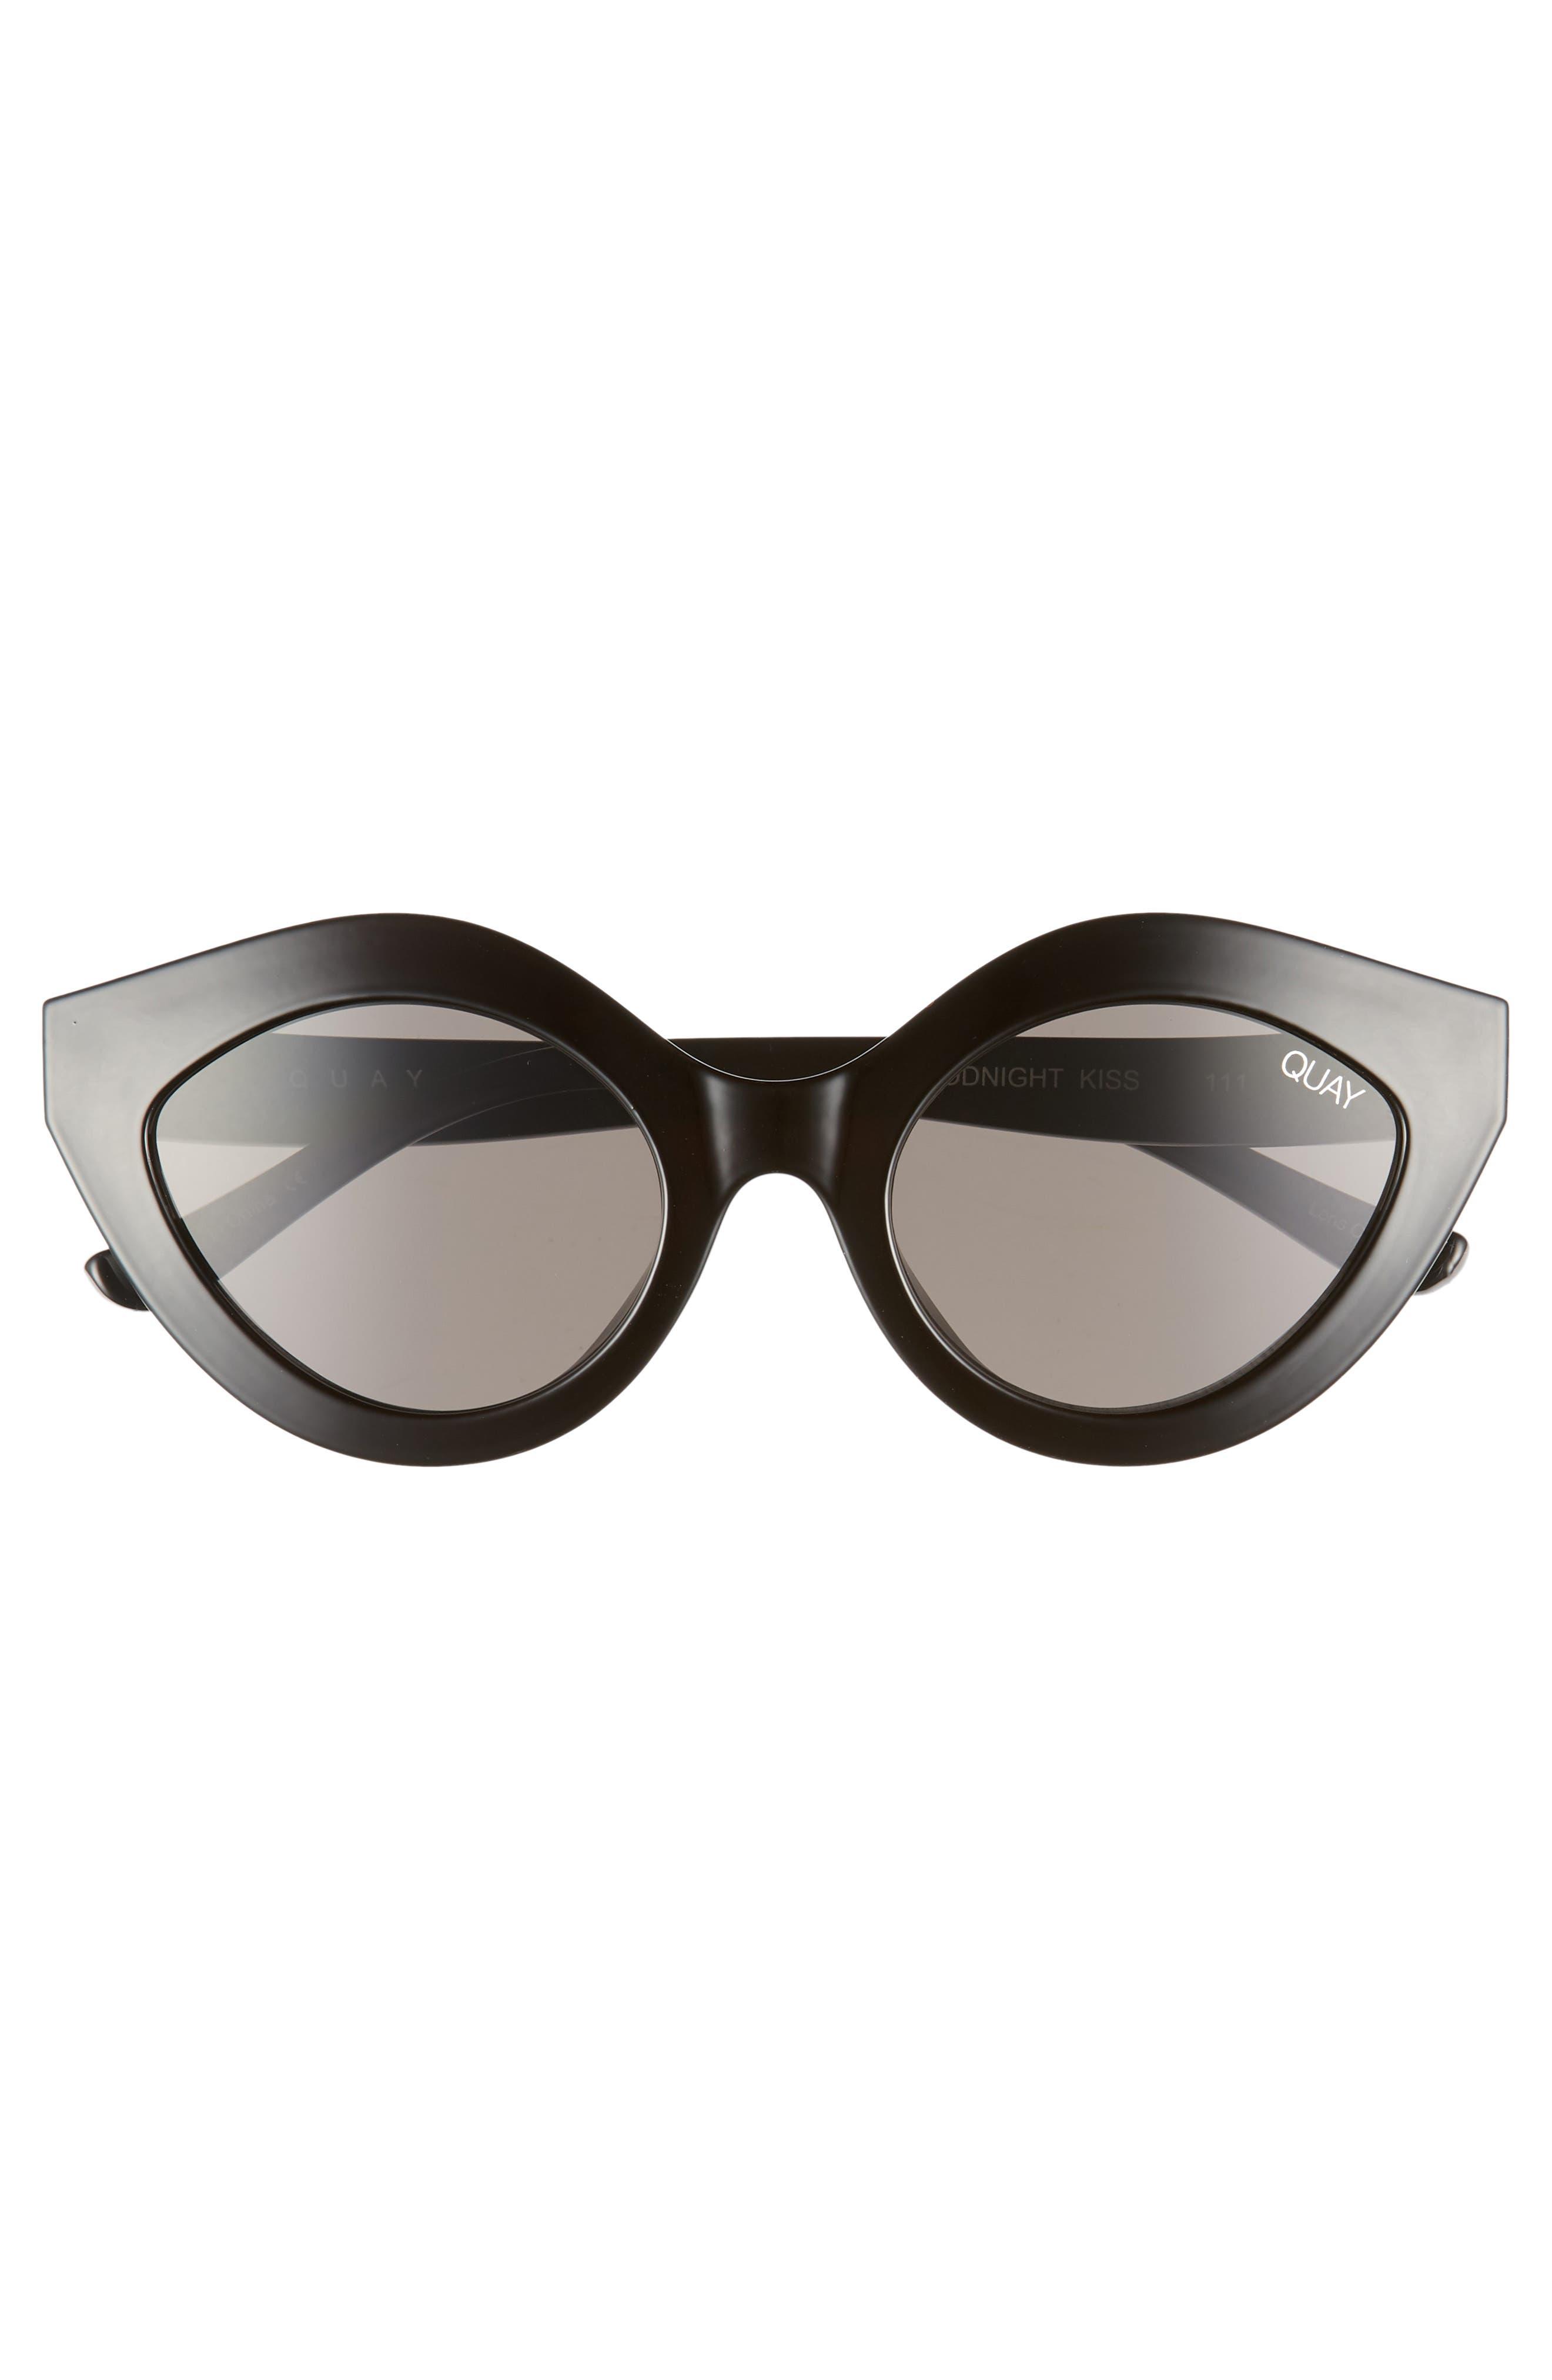 QUAY AUSTRALIA, Goodnight Kiss Cat Eye Sunglasses, Alternate thumbnail 3, color, BLACK / SMOKE